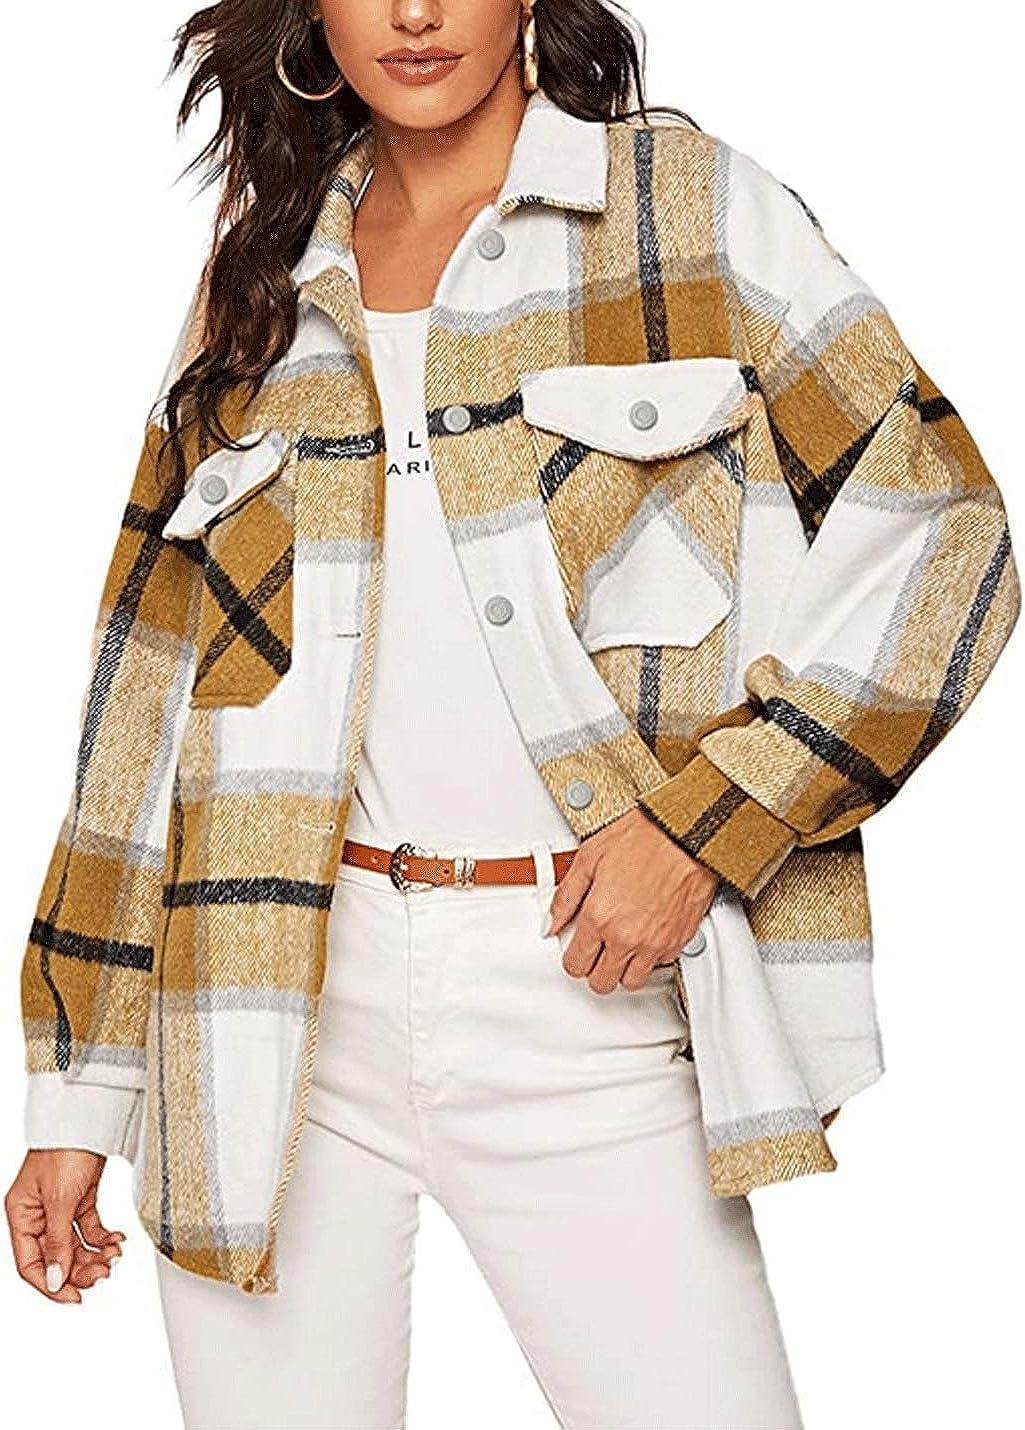 Bankeng Women's Casual Wool Blend Plaid Button Down Long Sleeve Multi-Pocket Jacket Coat